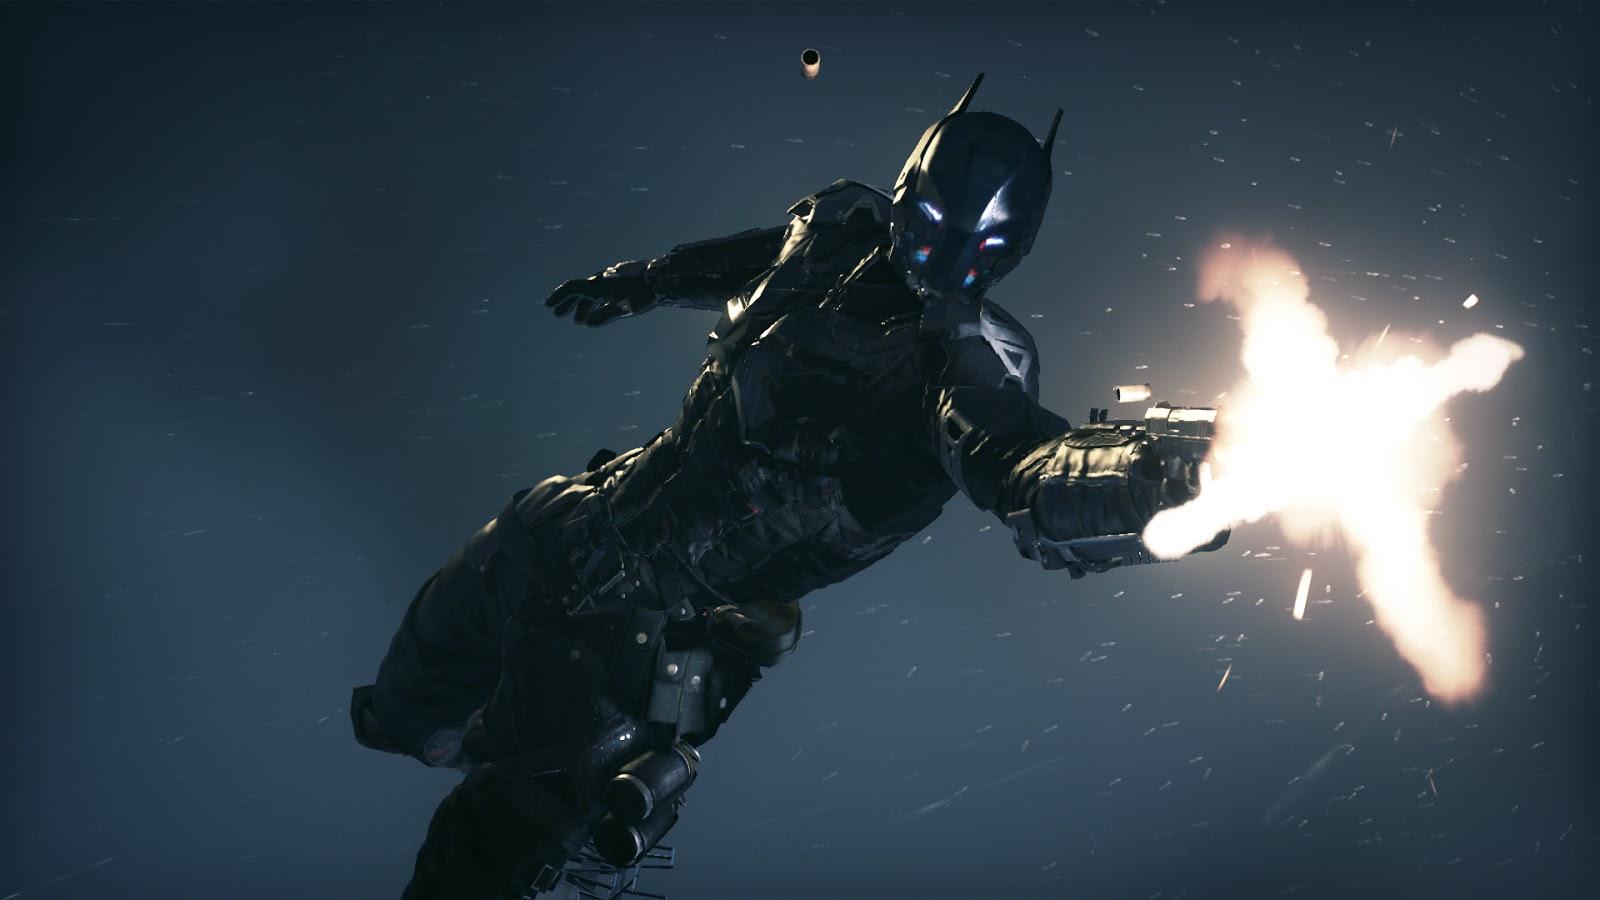 Batman: Arkham Knight Preview Image